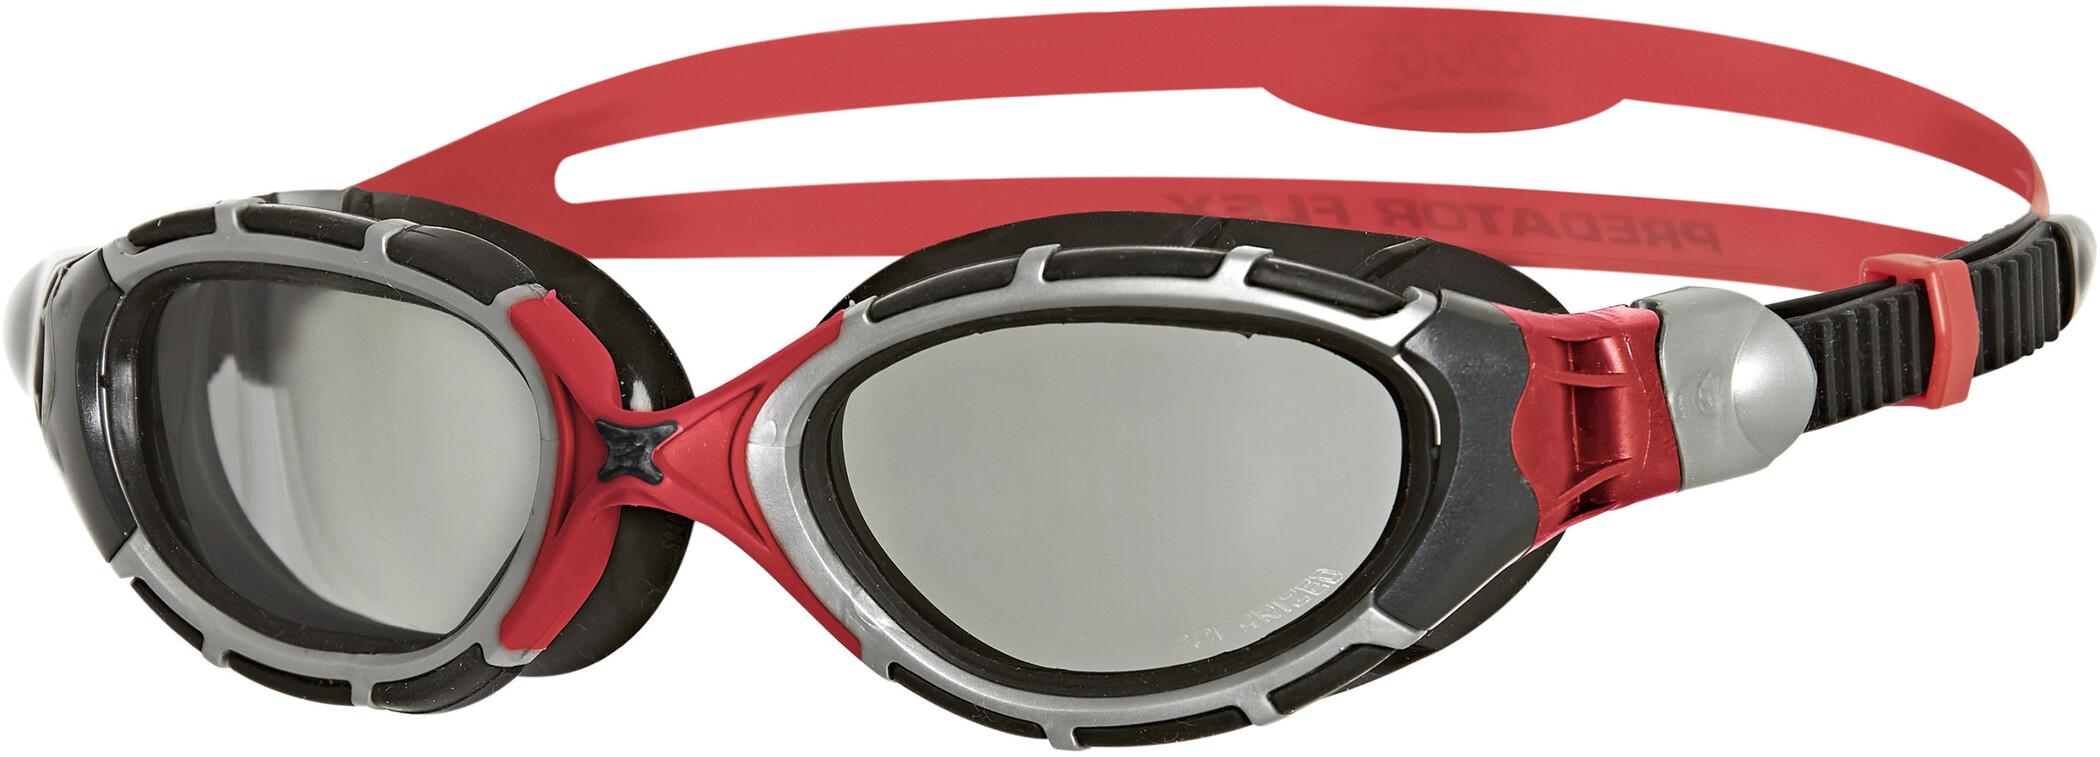 Zoggs Predator Flex Svømmebriller Polarized Reactor, grey/red/black (2019) | swim_clothes